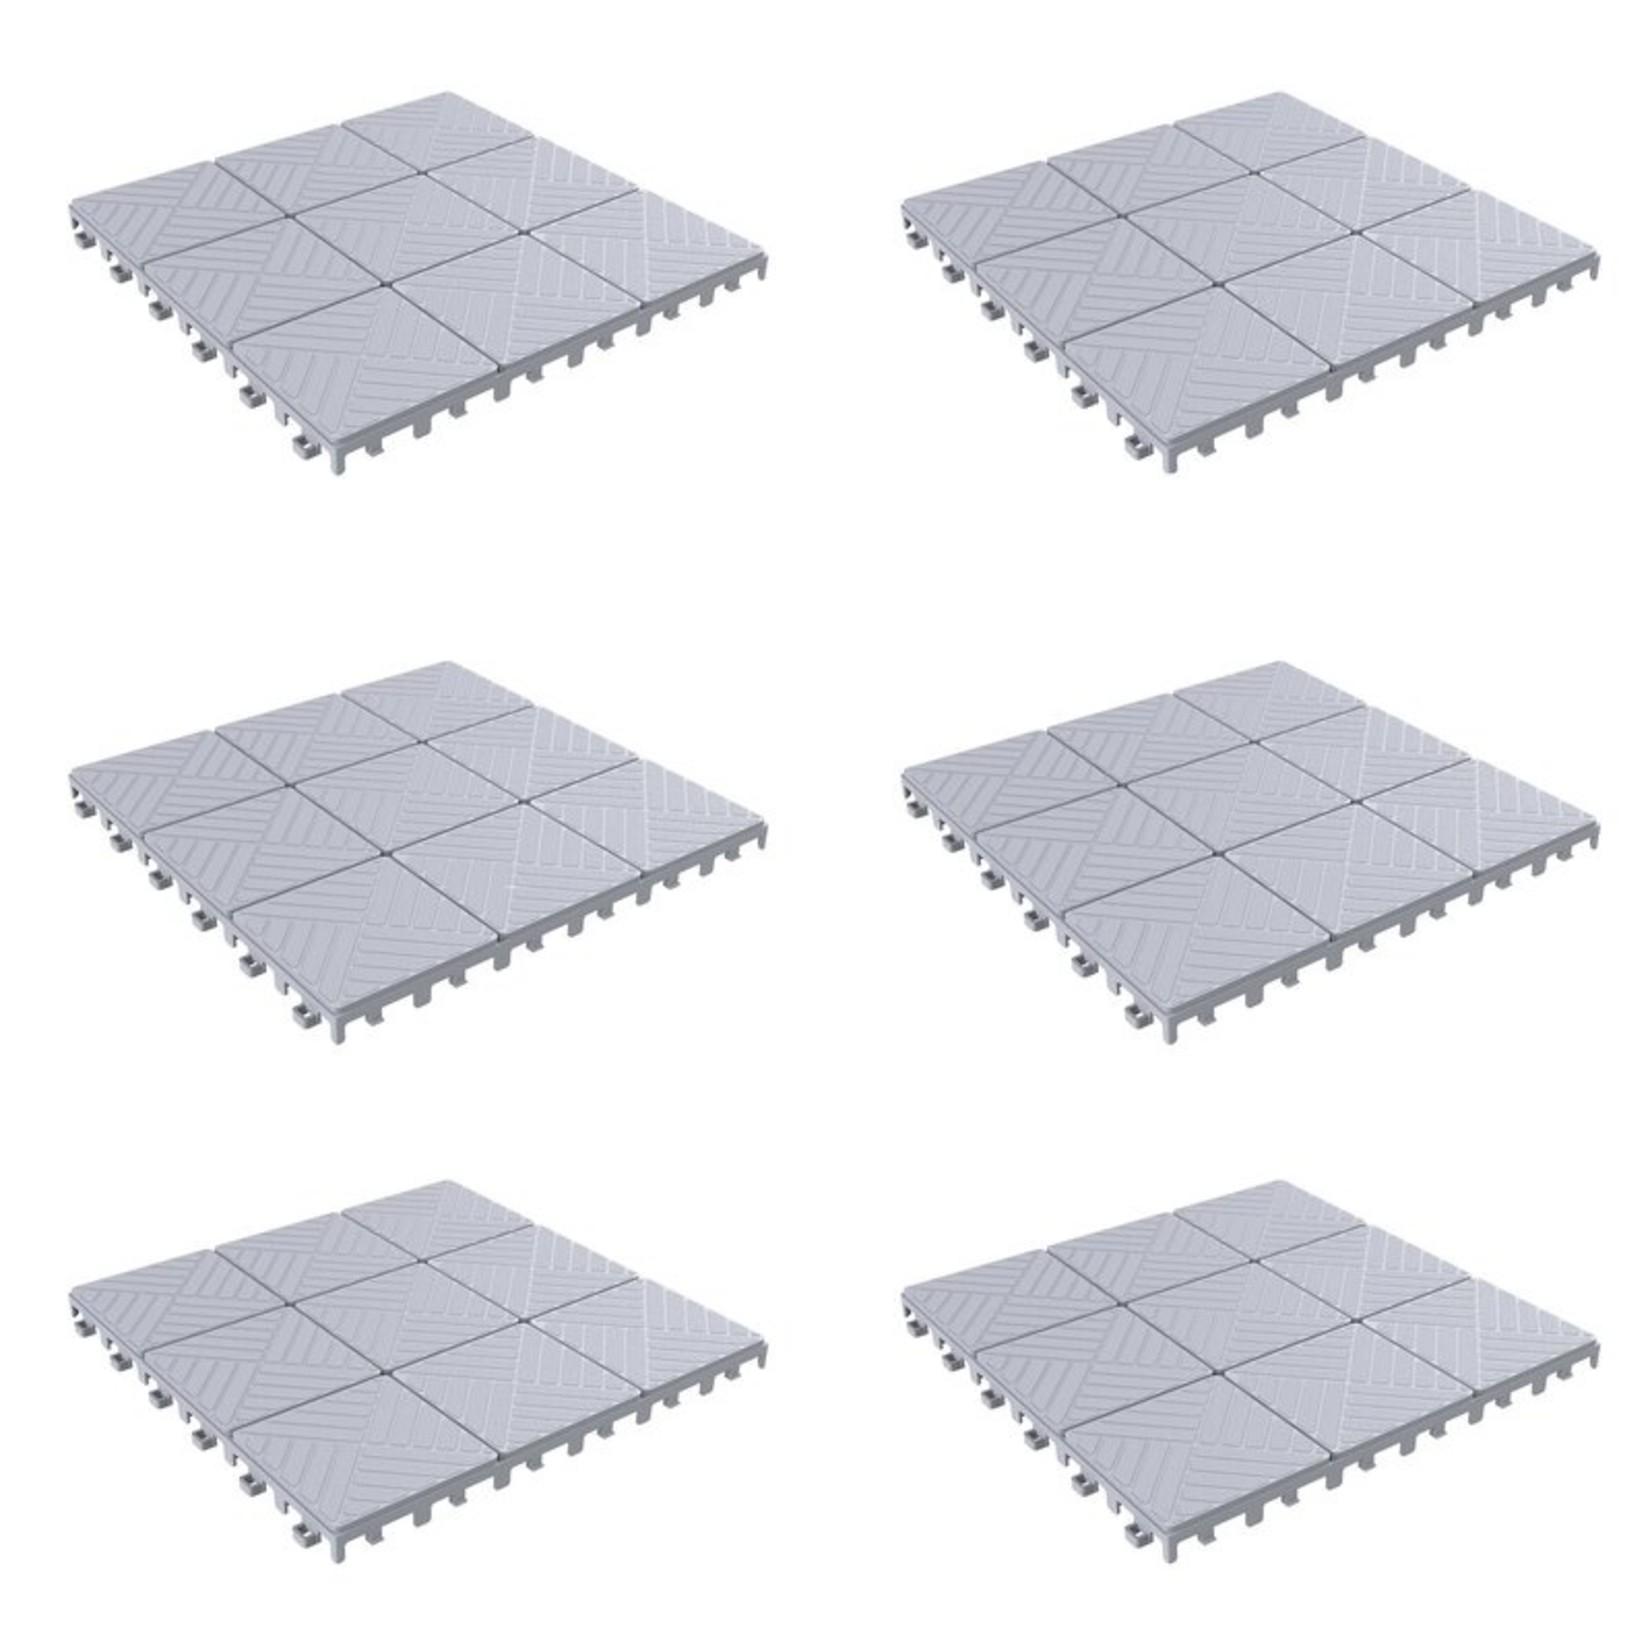 "*11.5"" x 11.5"" Plastic Interlocking Deck Tile in Gray (Set of 6)"